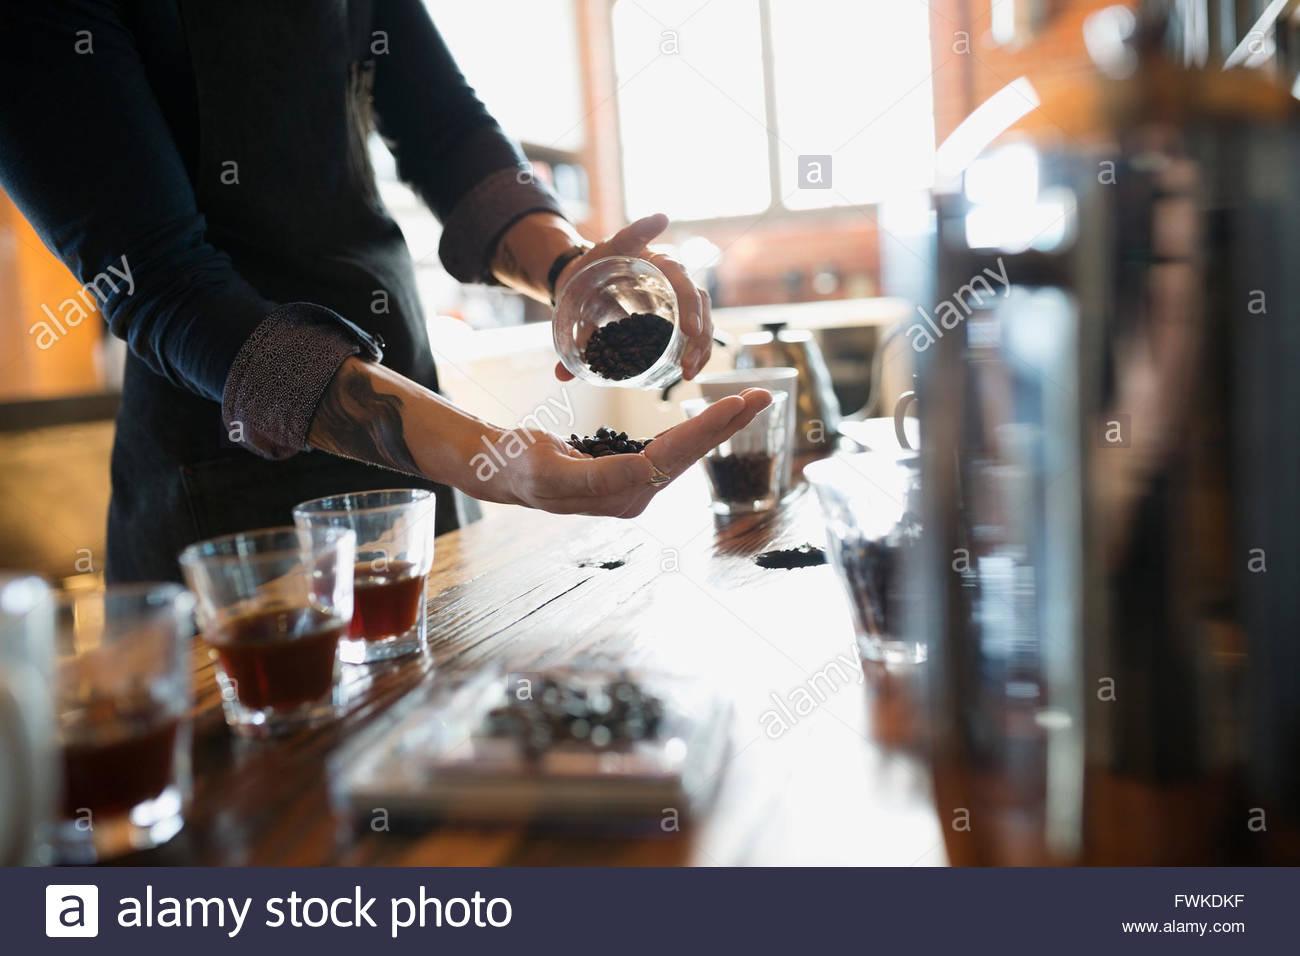 Entrepreneurial coffee roaster examining beans - Stock Image